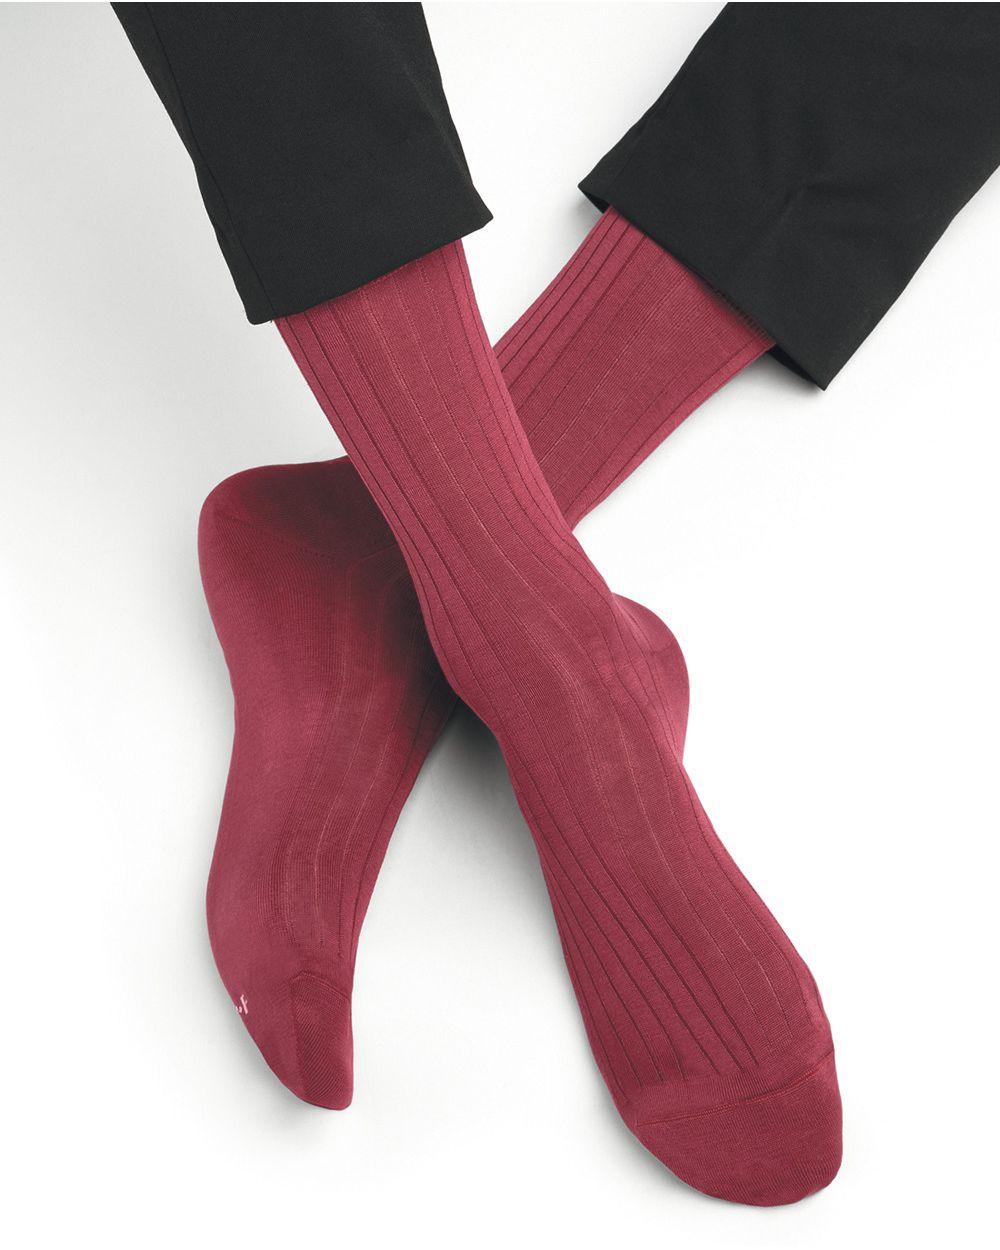 Ribbed socks in 100% mercerised cotton